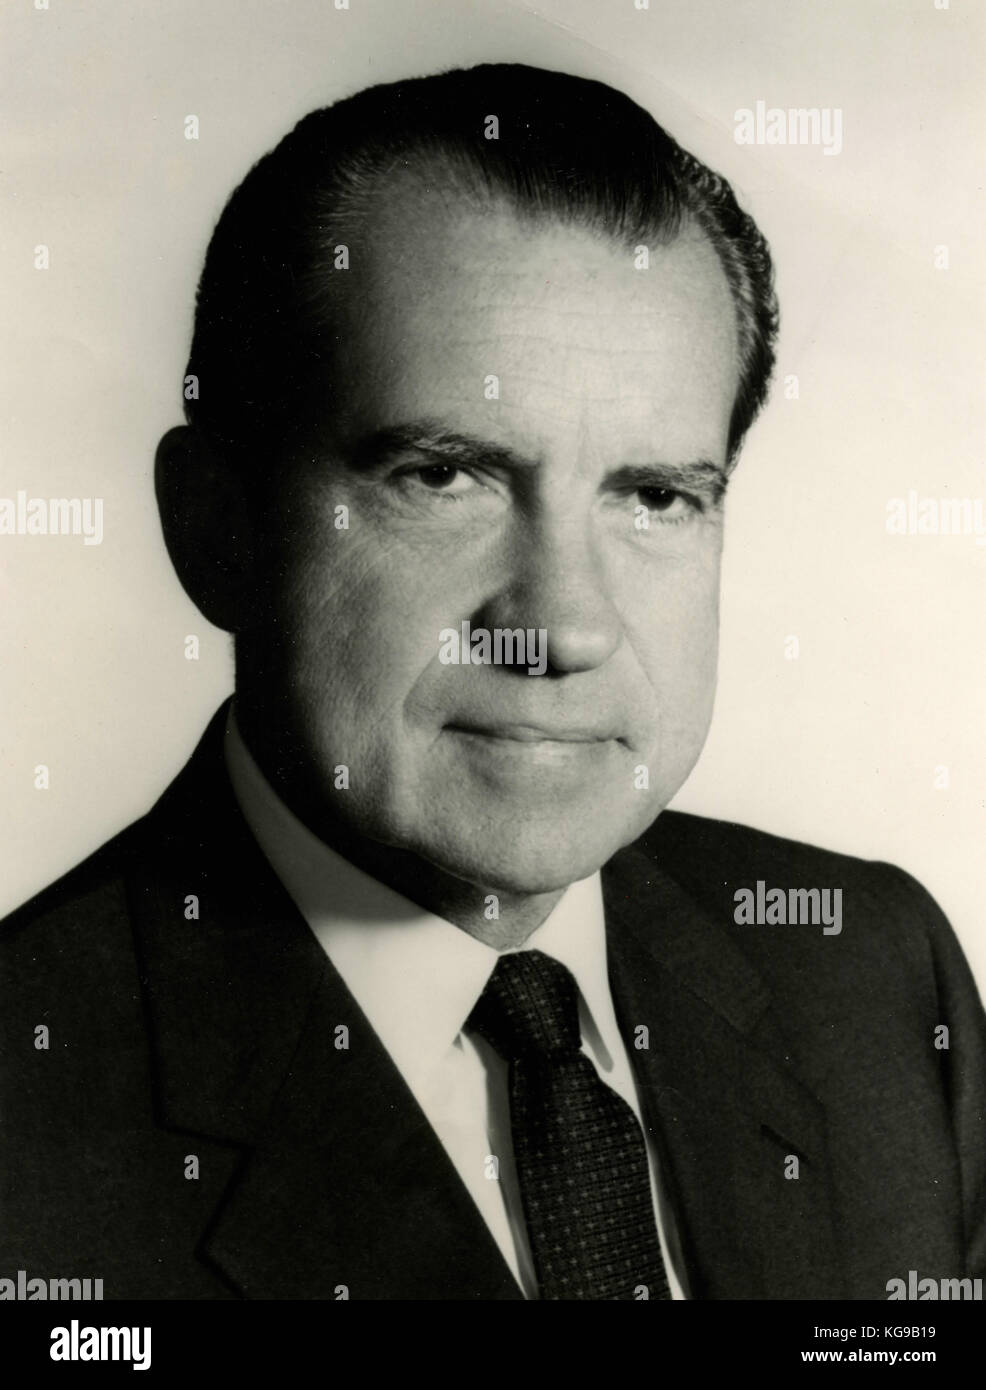 37th USA President Richard Nixon - Stock Image